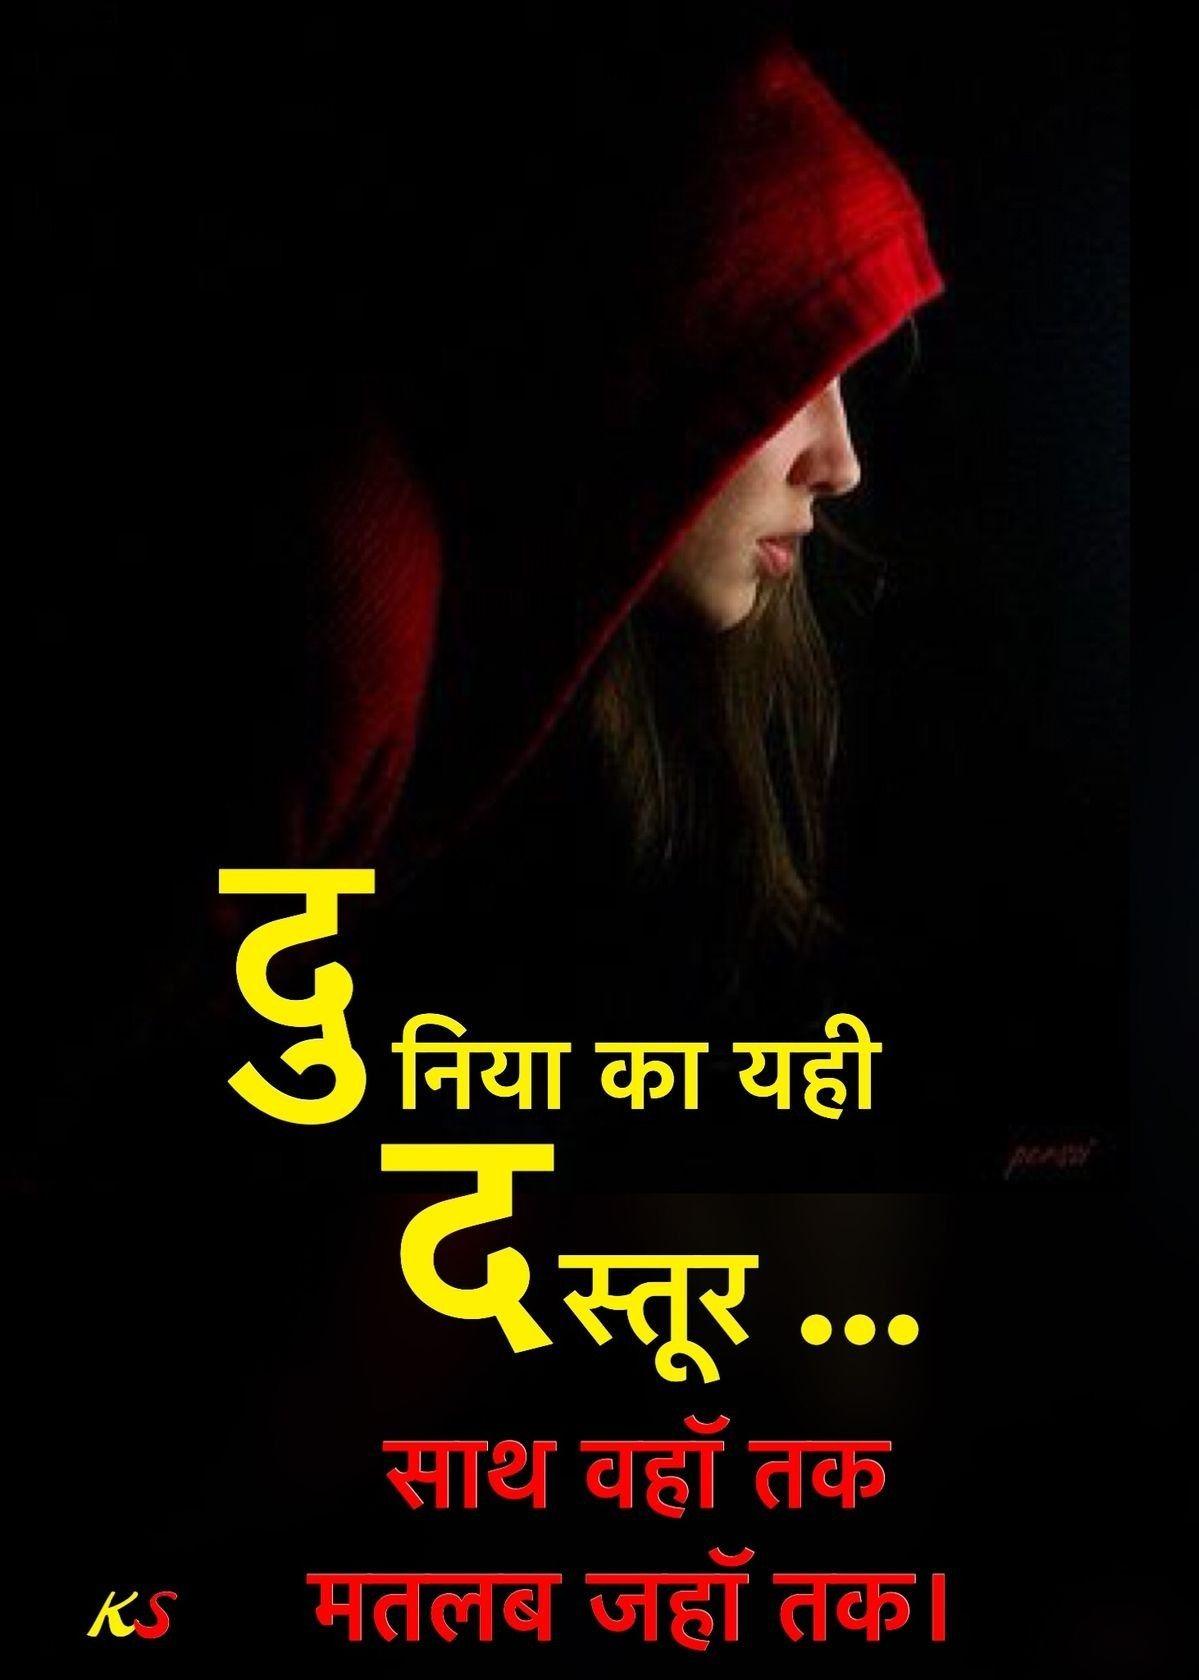 heartbroken WhatsApp status images free download